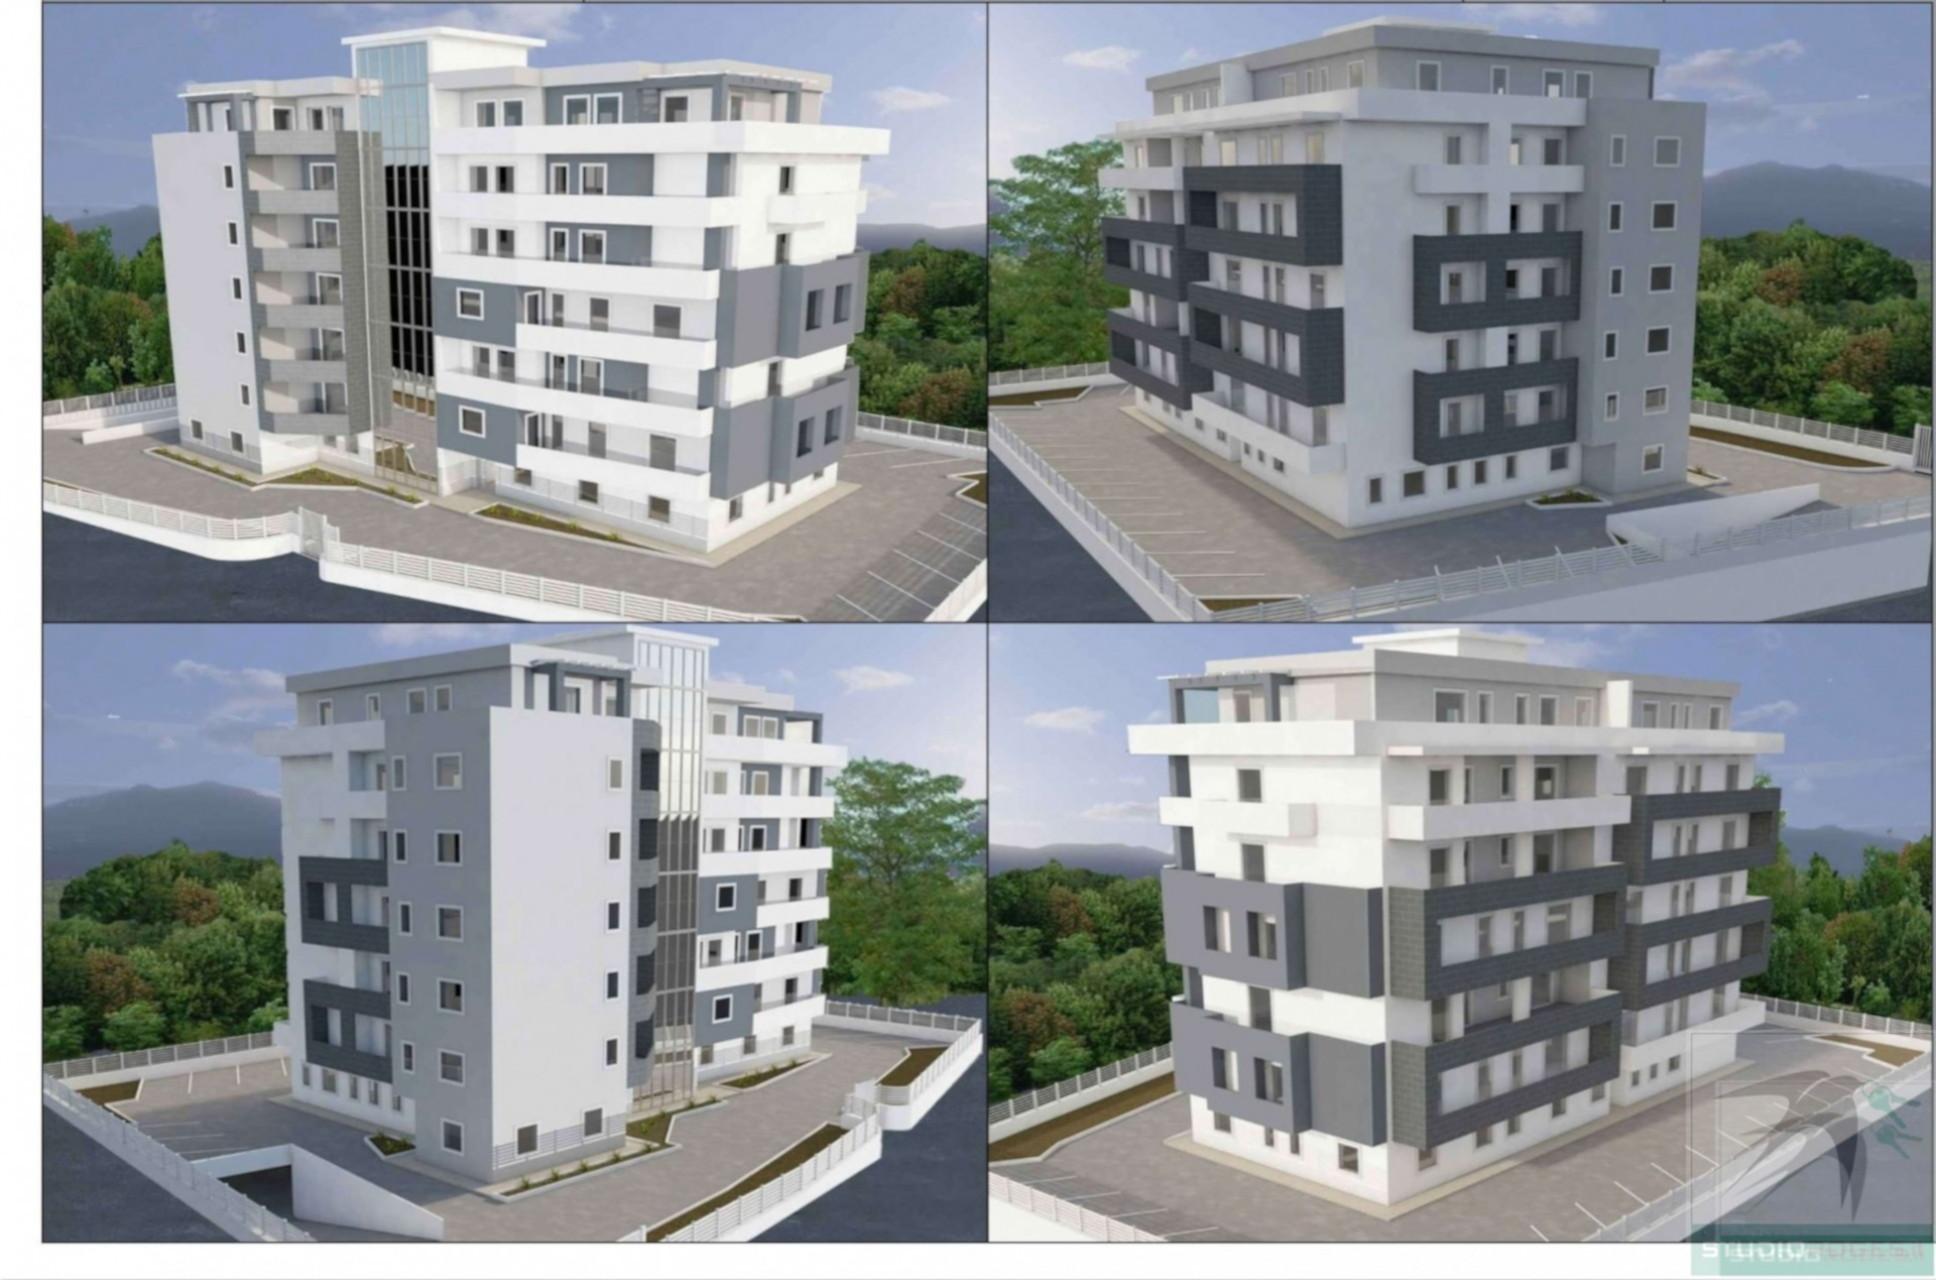 Appartamento in Vendita 108,90 mq - N. camere: 3 - - Rende - Roges-Commenda (CS)